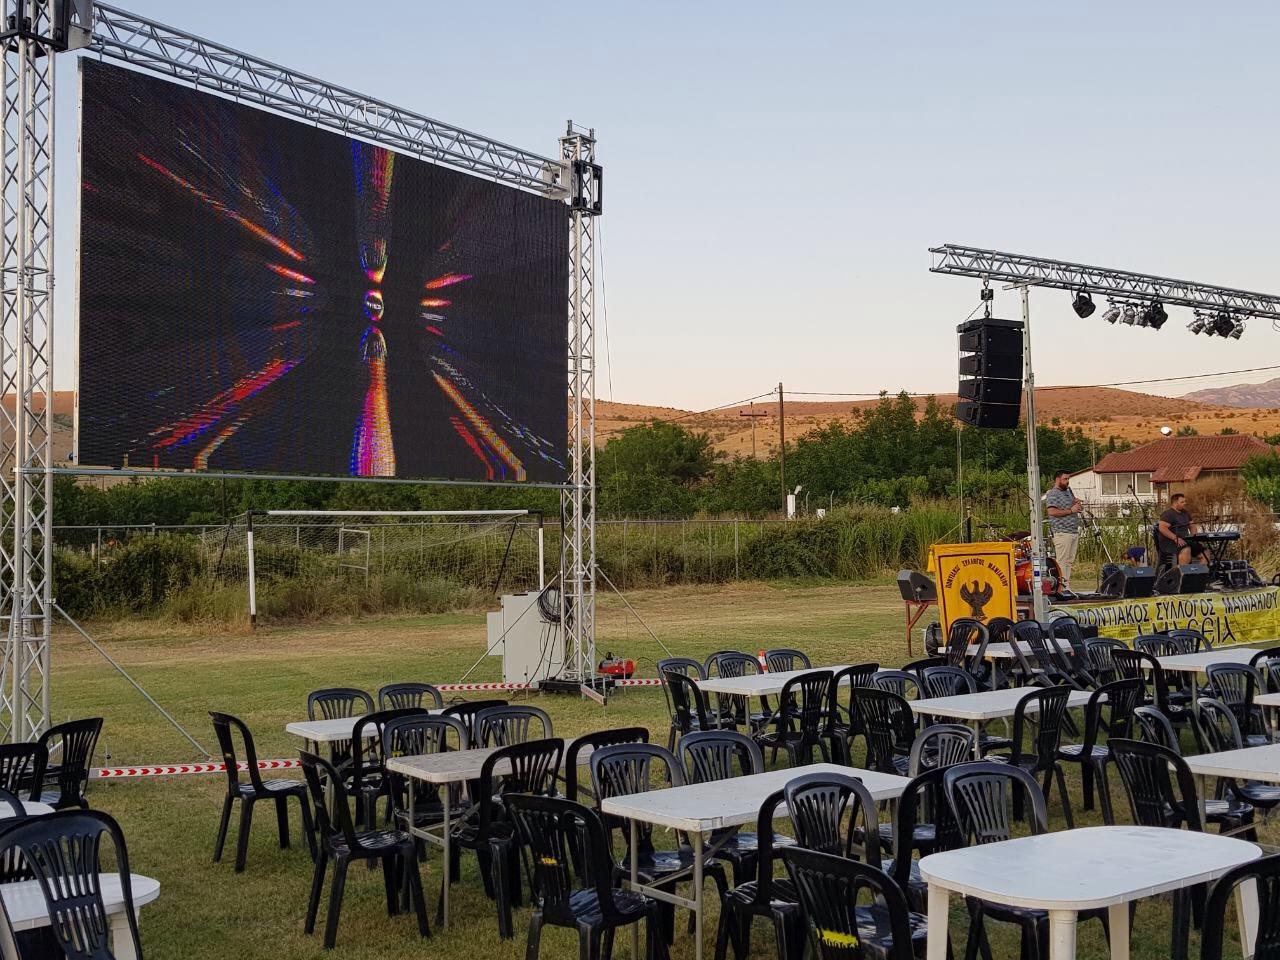 led wall rent on a concert ενοικιαση οθονης λεντ συναυλια